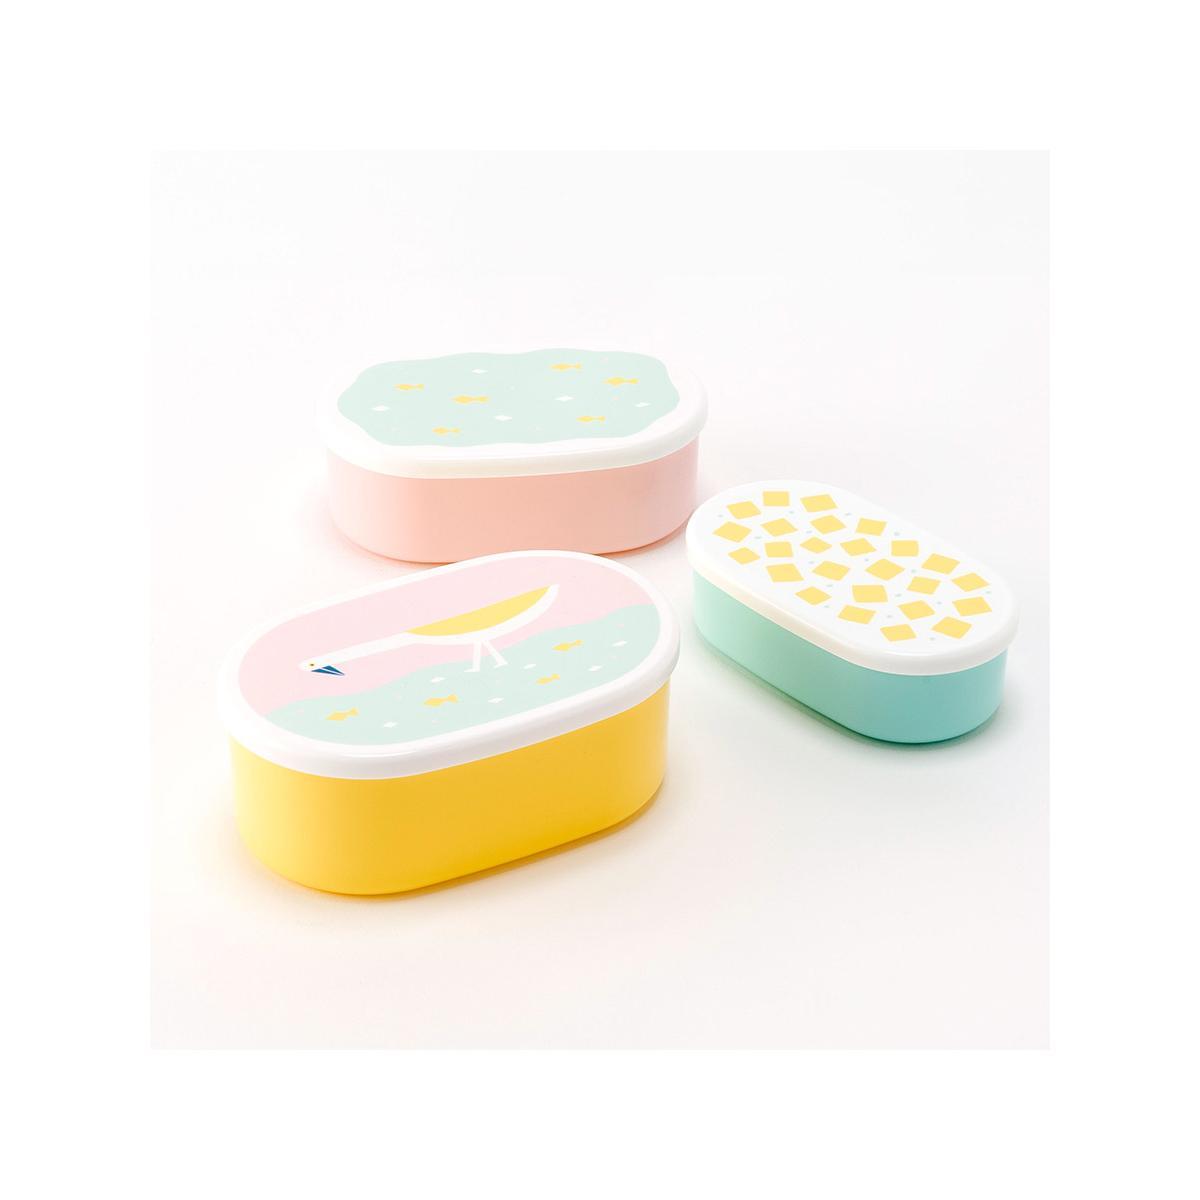 14 x 5cm PP食物盒套裝 (BPA free ) - 雀仔